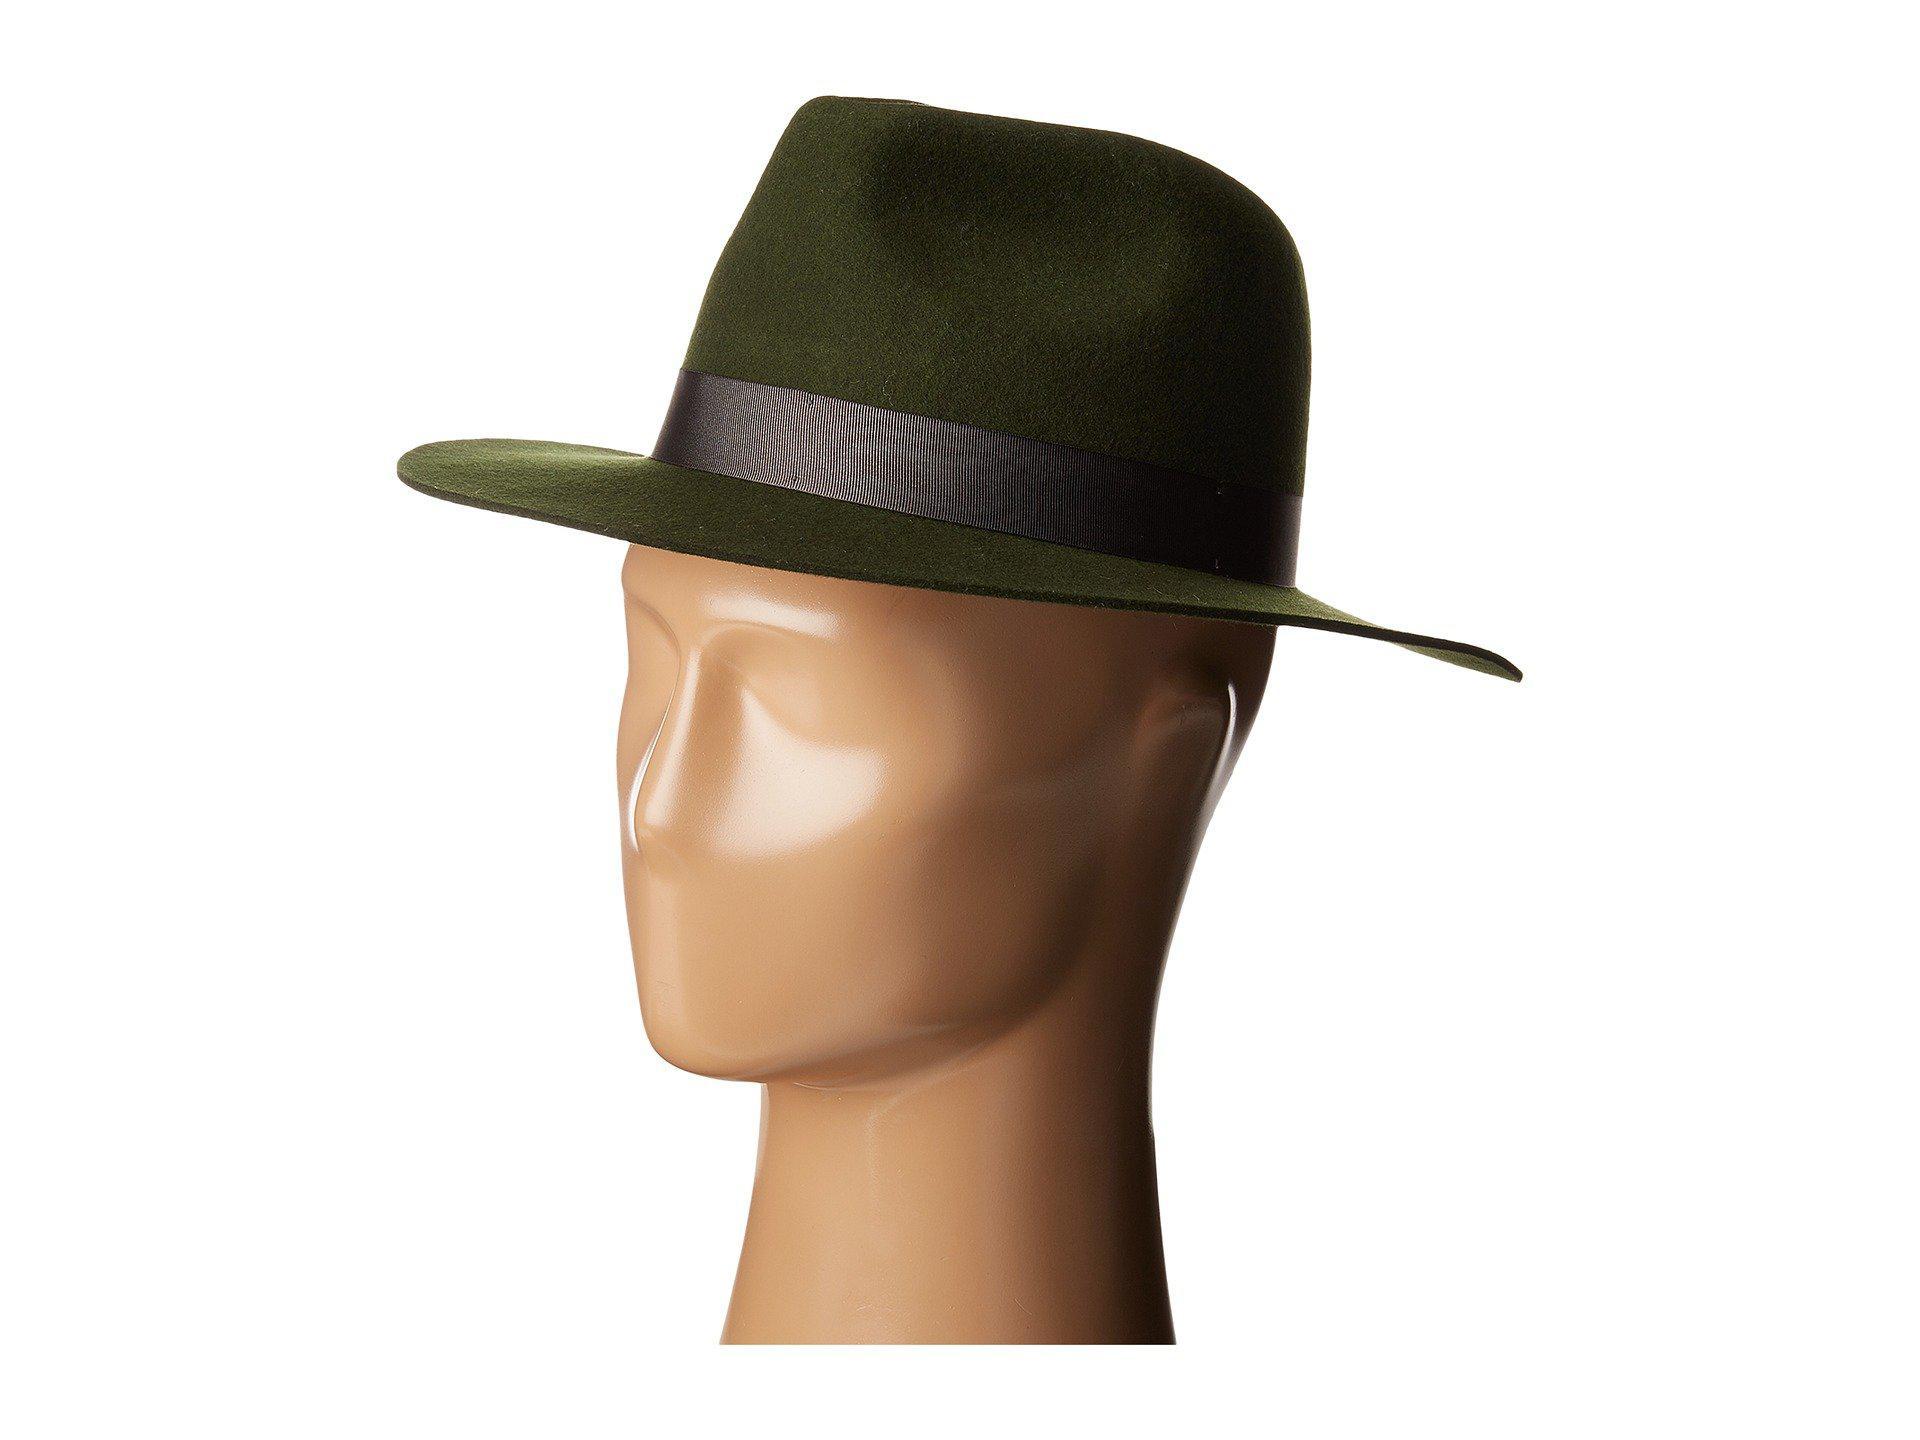 cf1299940e9d3 Lyst - Lack of Color Silent Woods Wool Felt Fedora in Green for Men